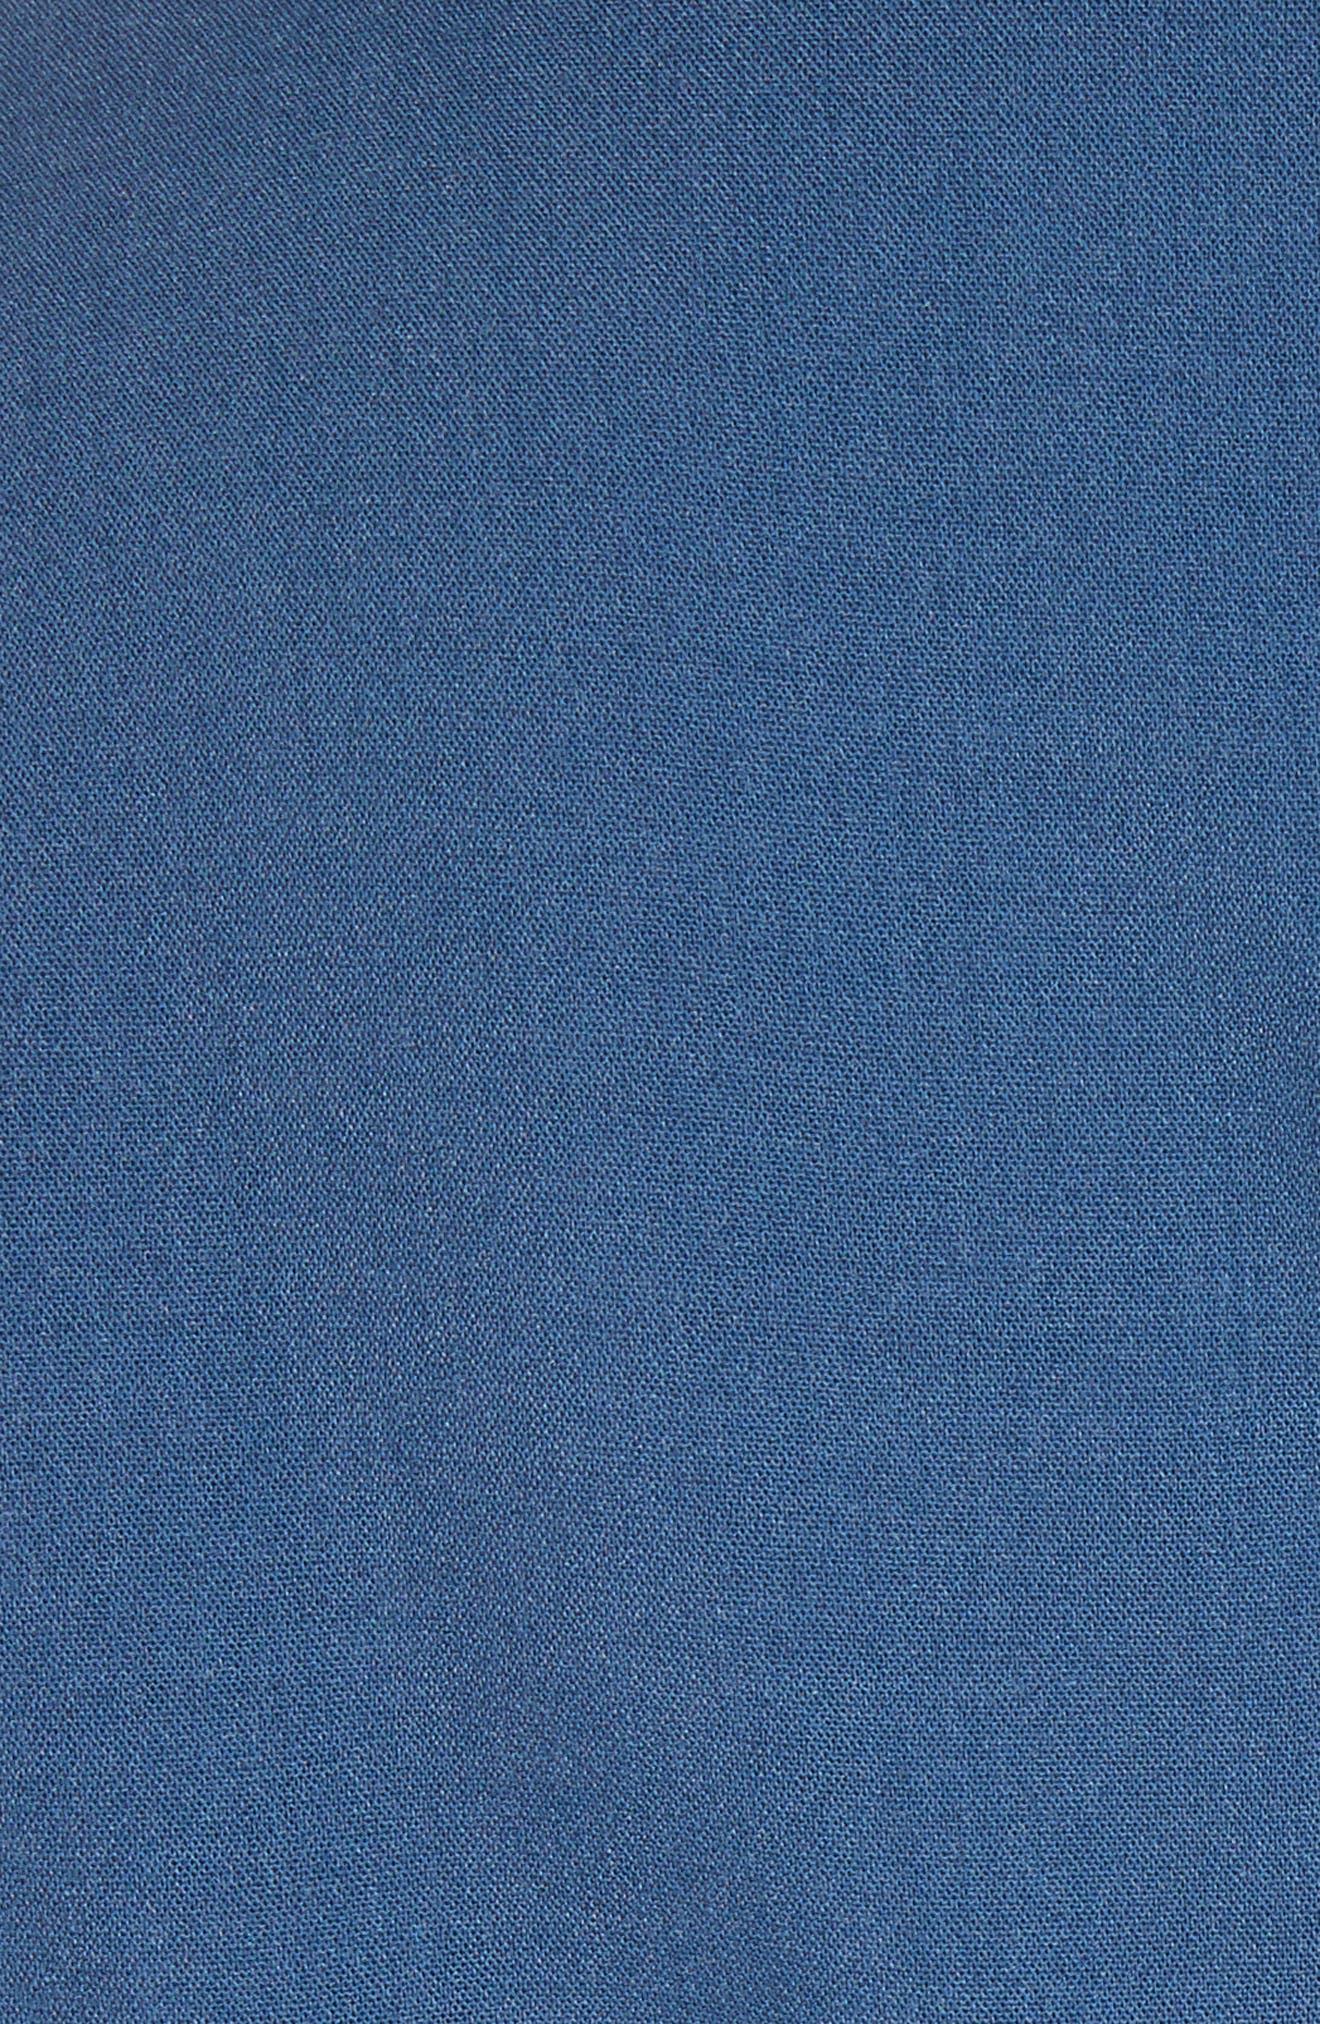 Gianna Asymmetrical Satin Dress,                             Alternate thumbnail 6, color,                             400